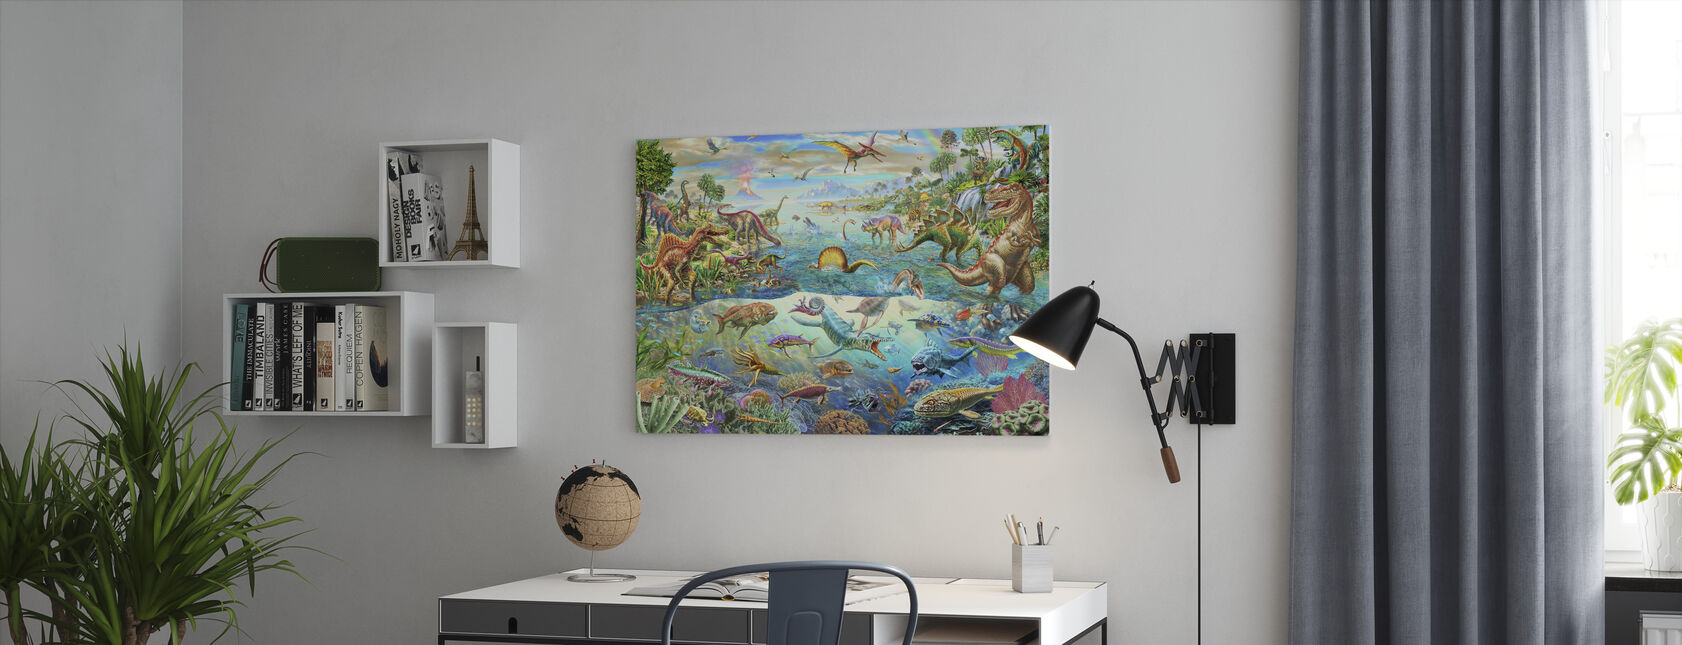 Prehistoric Paradise - Canvas print - Office